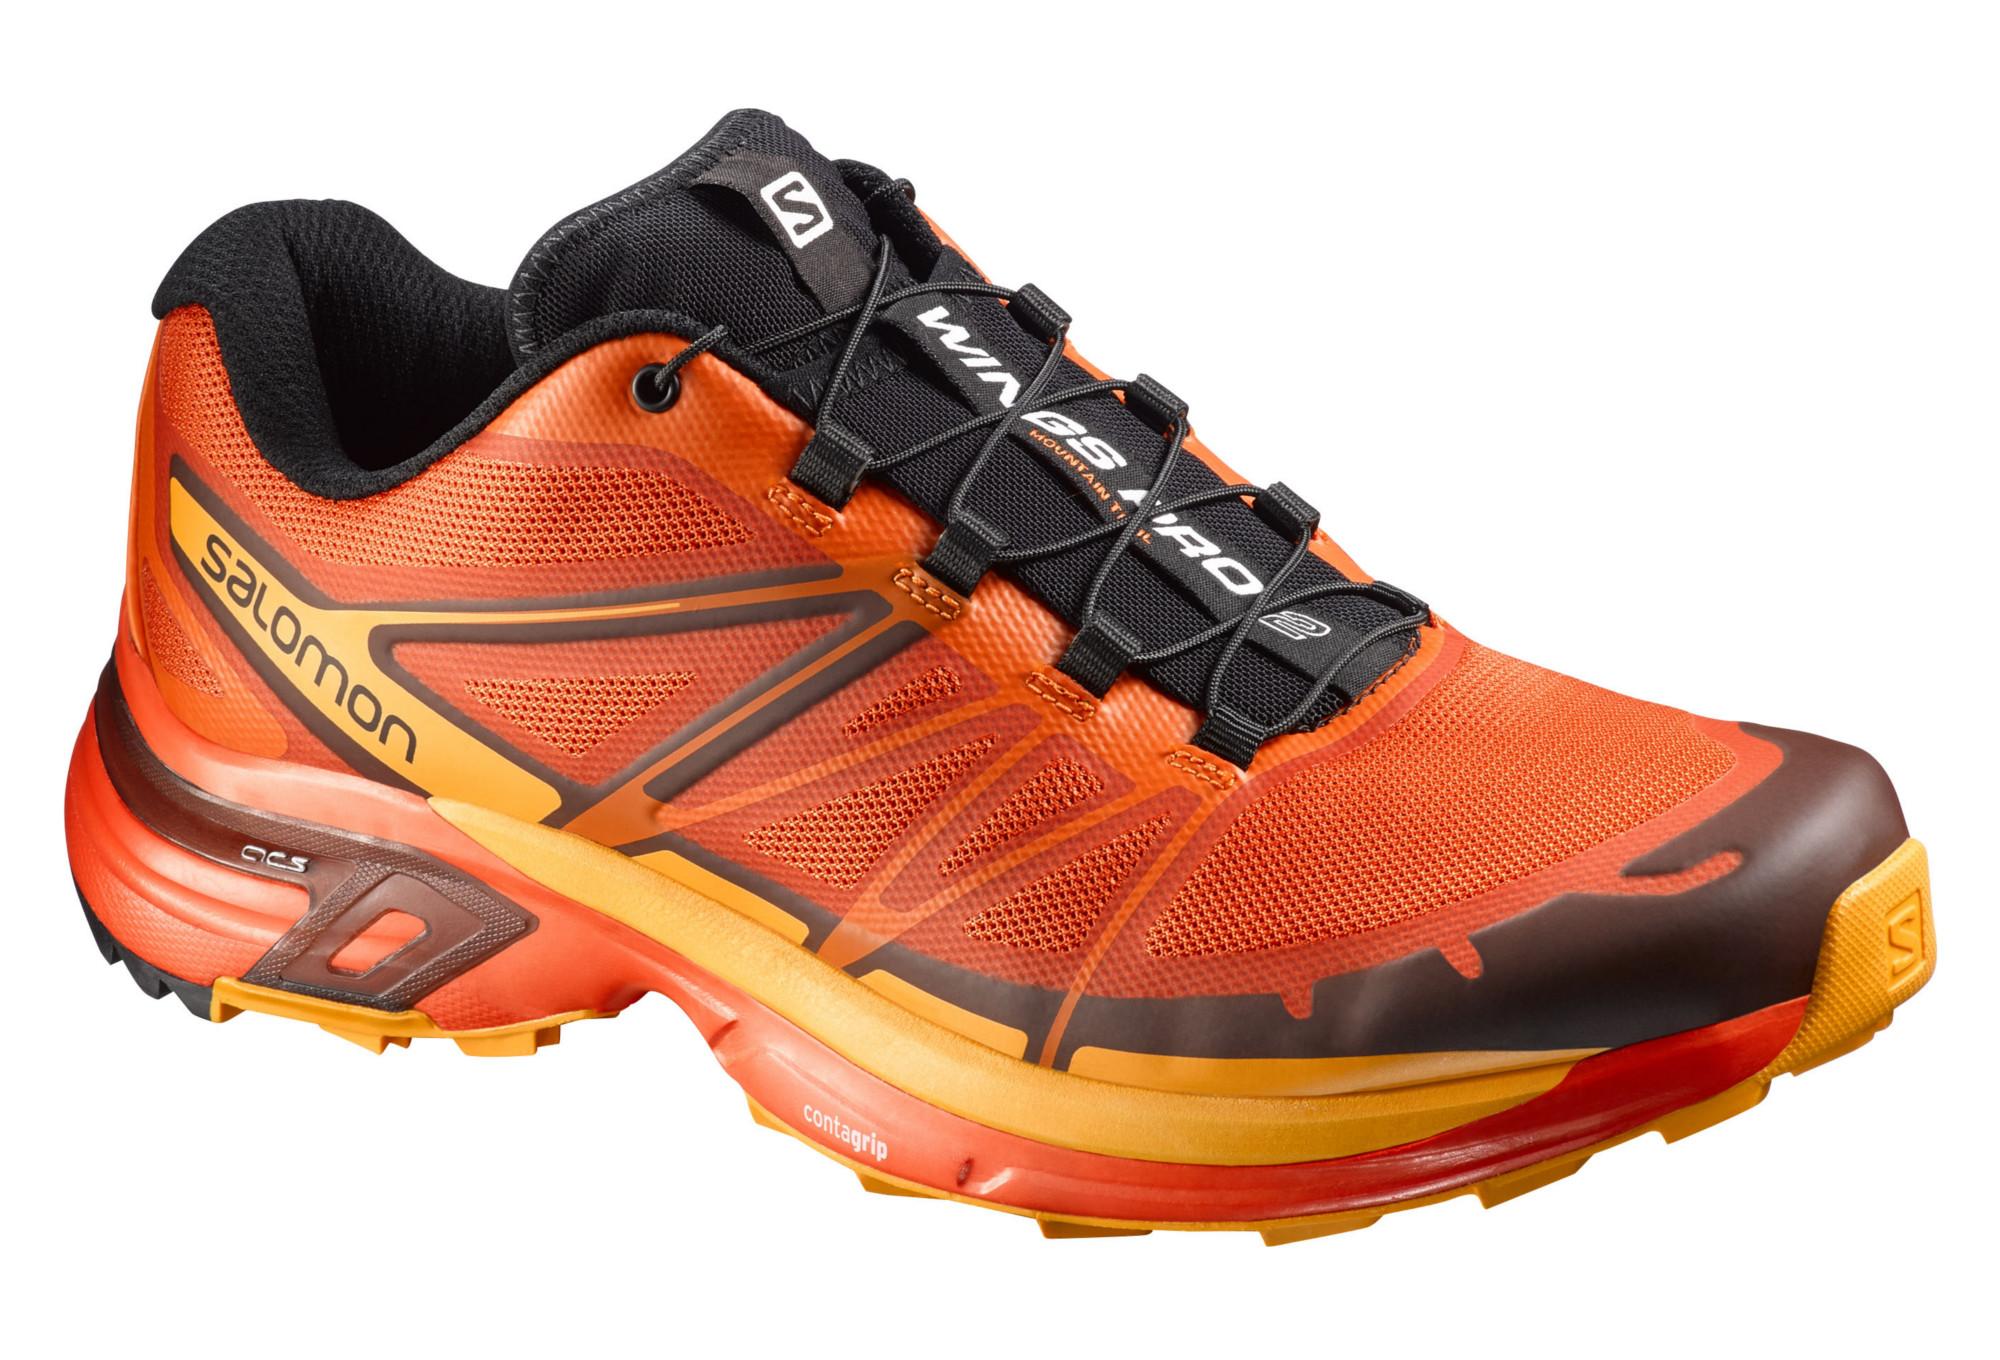 Salomon Wings Pro 2 Orange - Chaussures Chaussures-de-running Homme